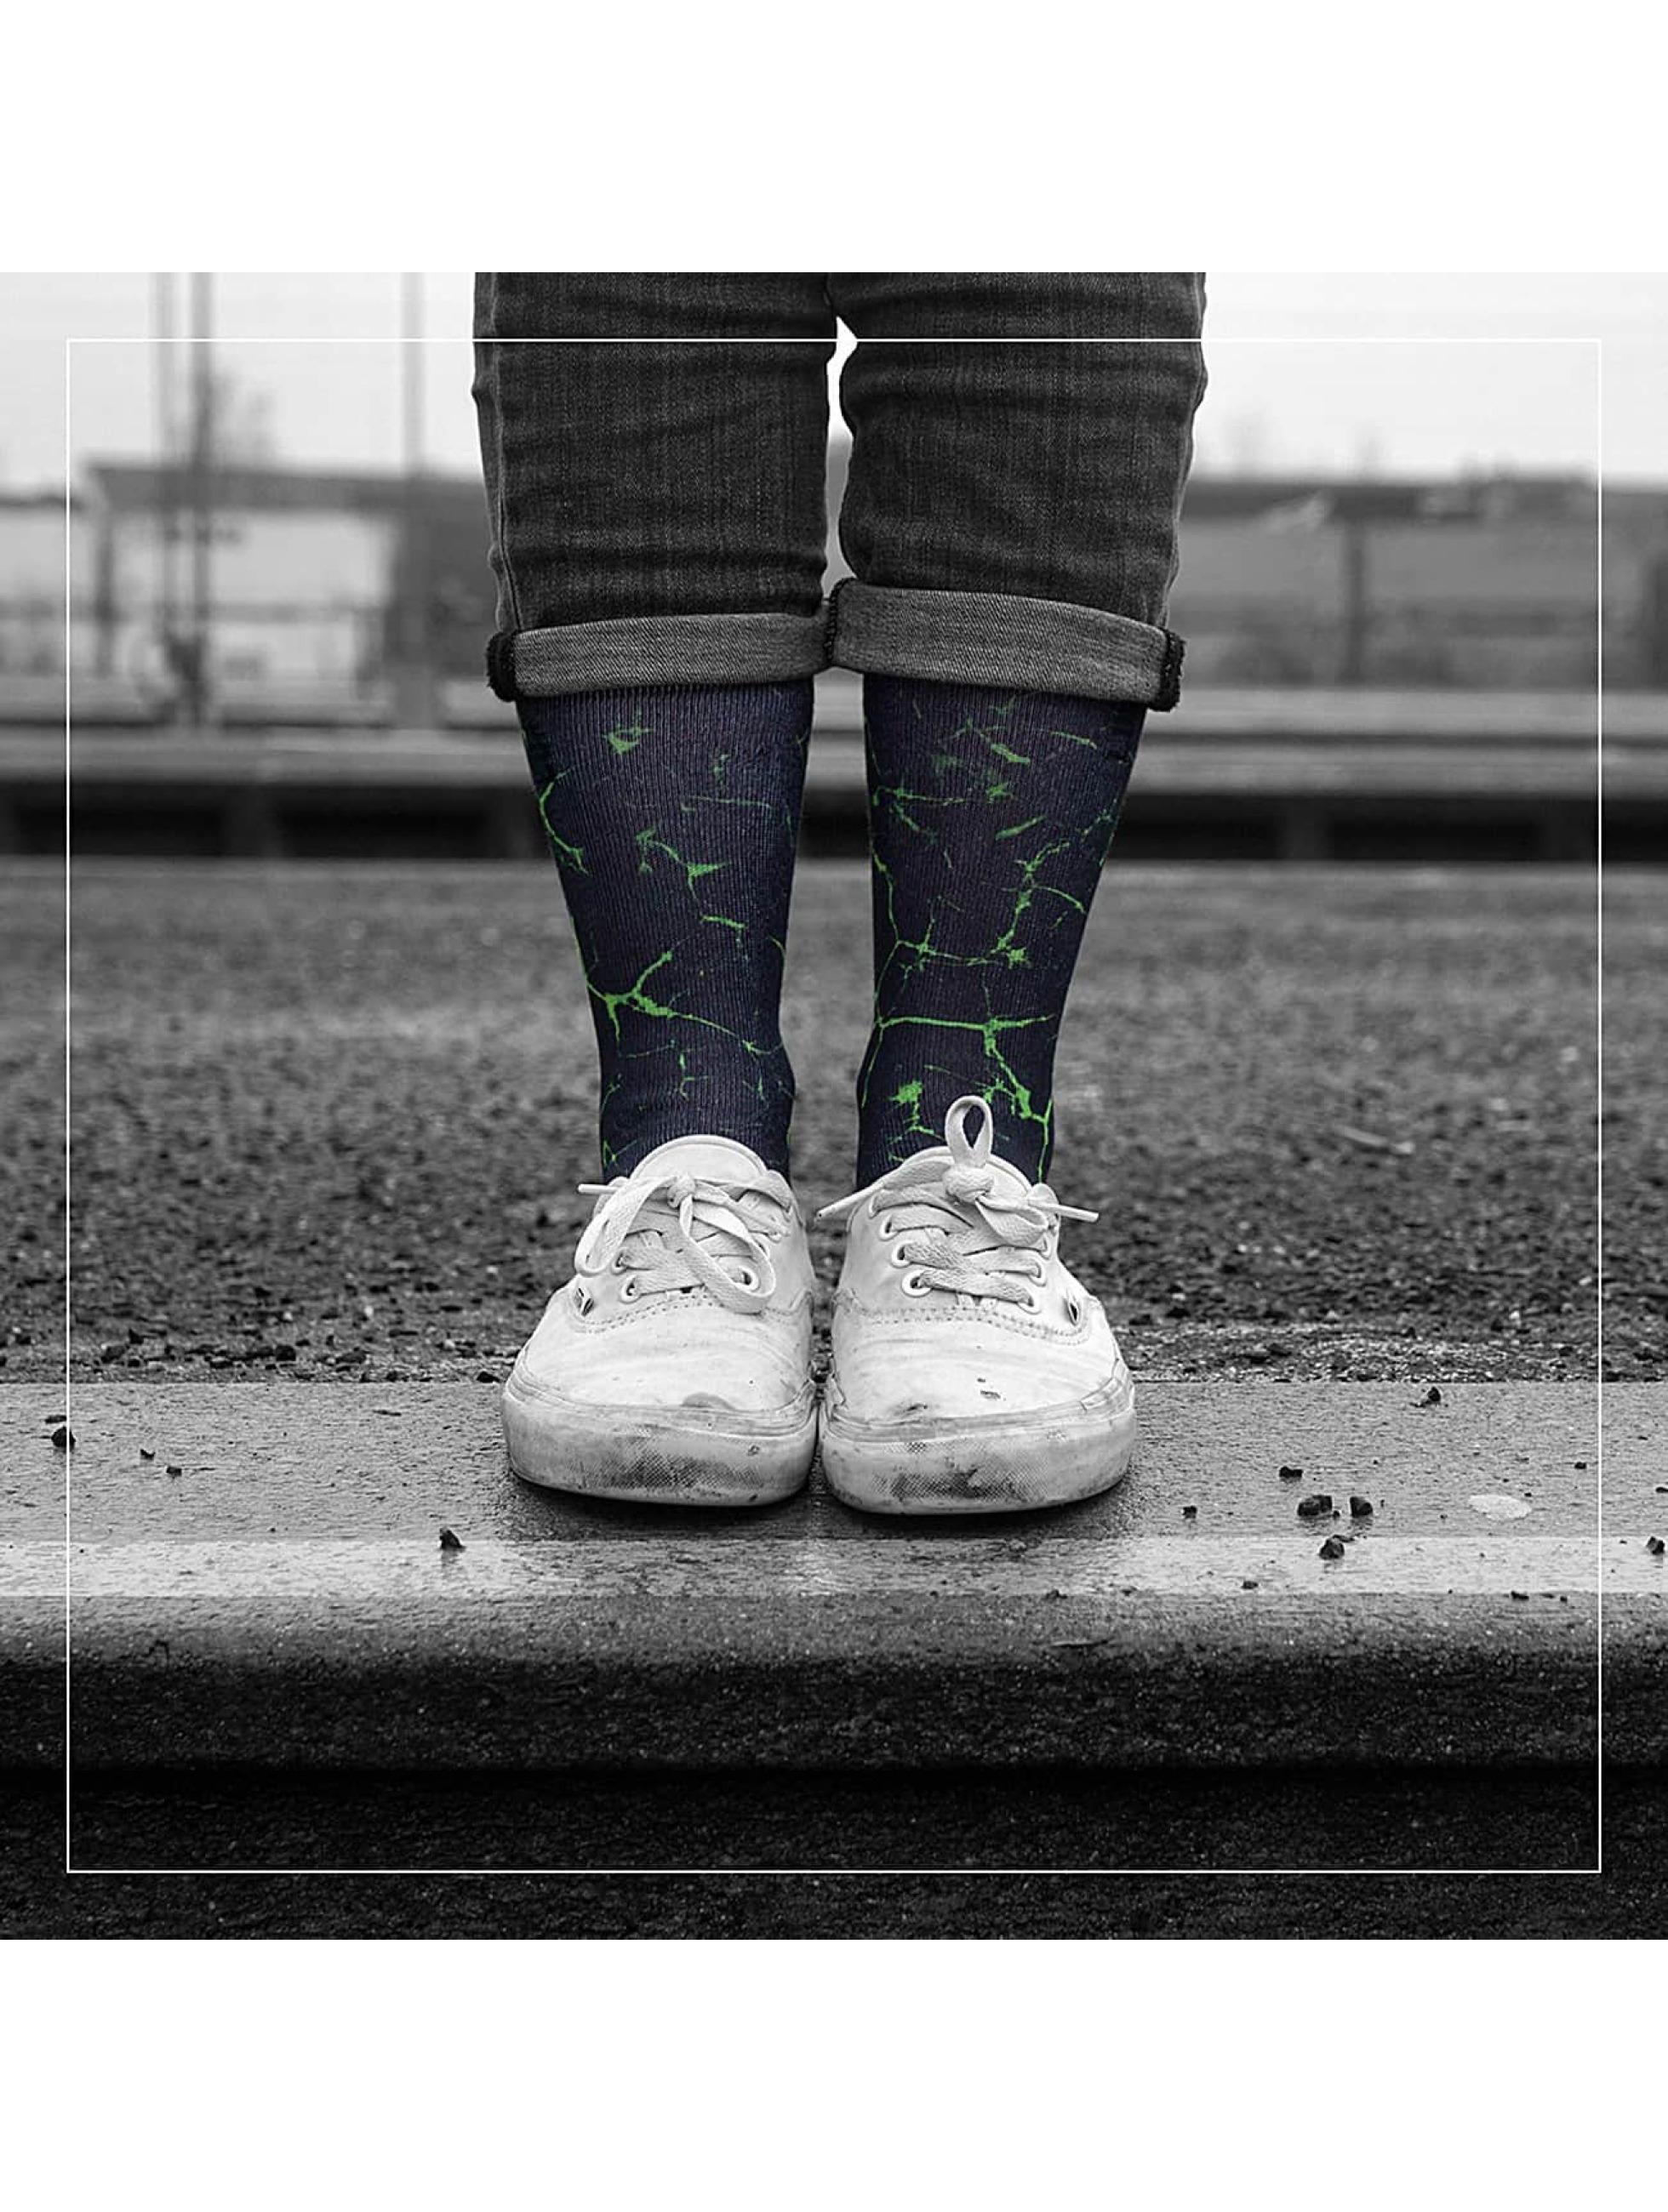 LUF SOX Chaussettes Smould multicolore